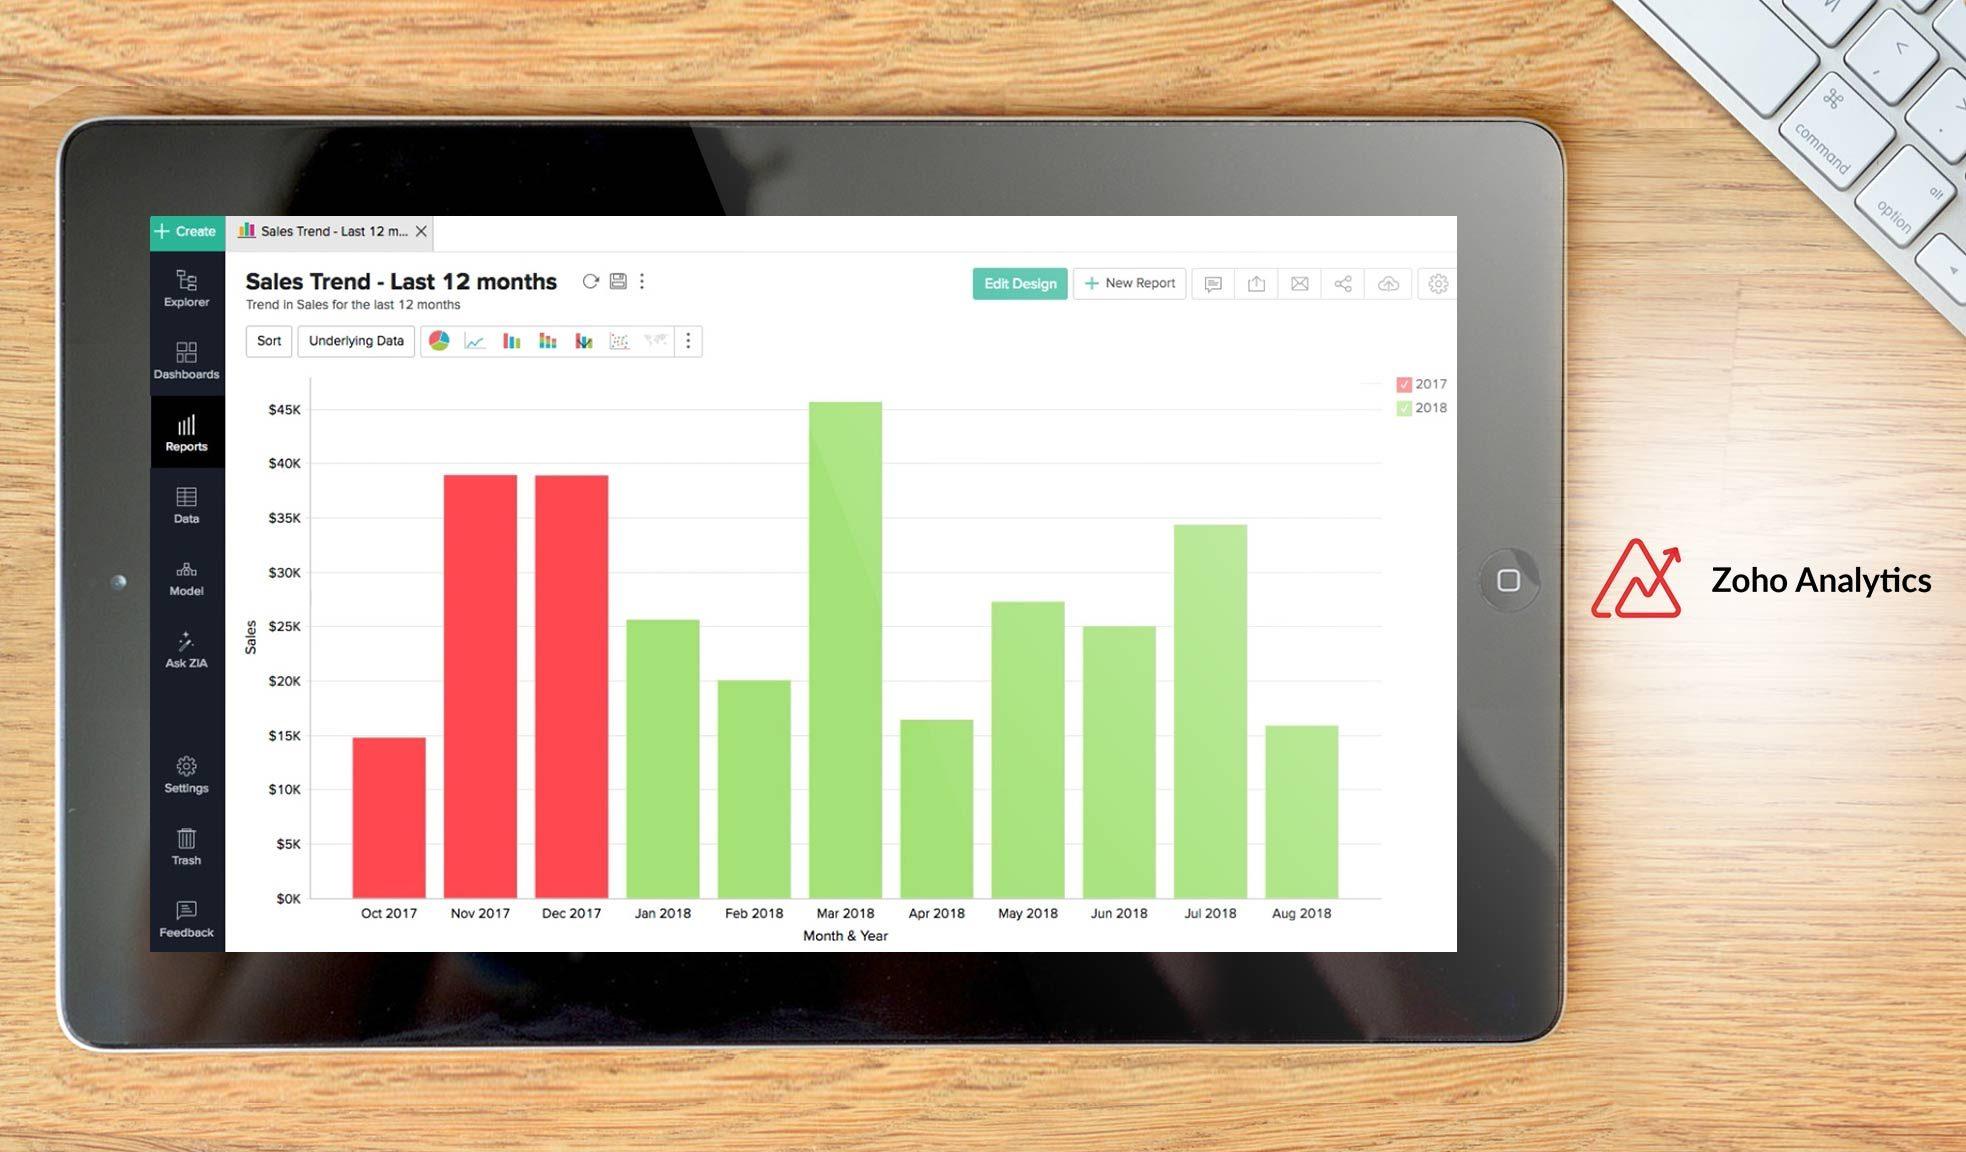 zoho analytics dasbhboard example